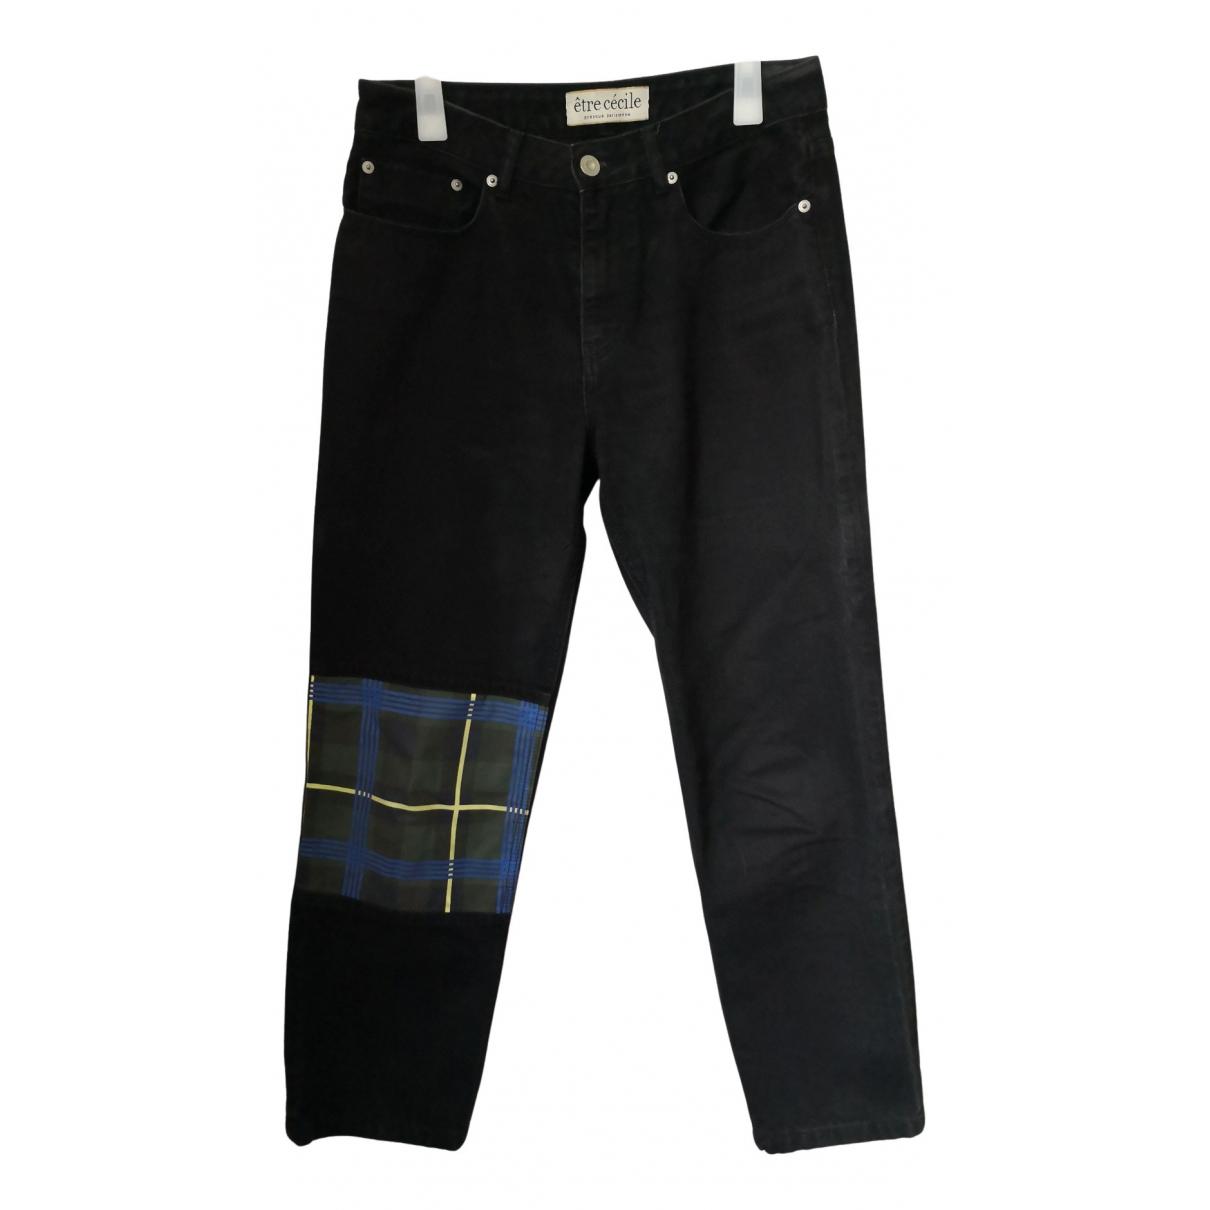 Etre Cecile N Black Denim - Jeans Jeans for Women 28 US